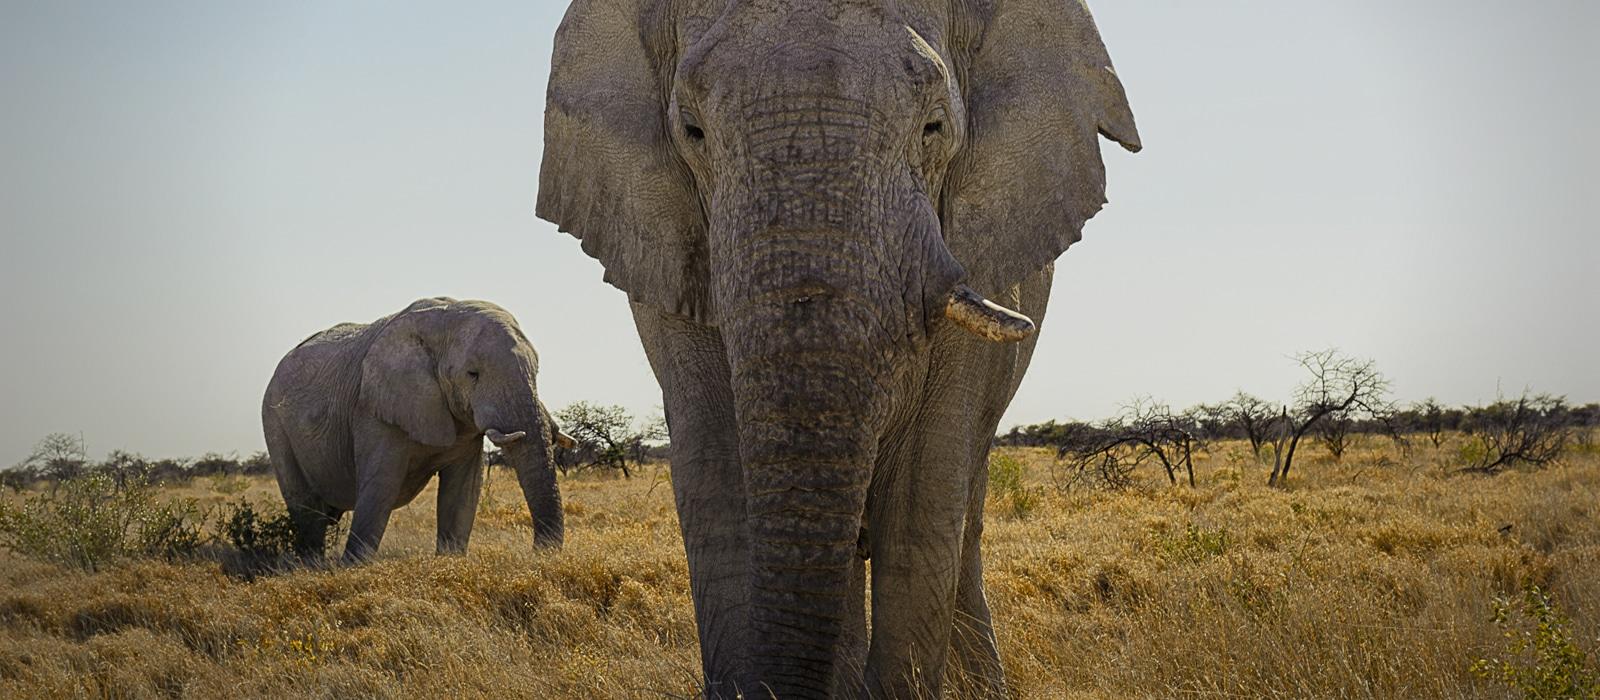 Éléphant, Etosha, Himba, Namibie - les Routes du Monde